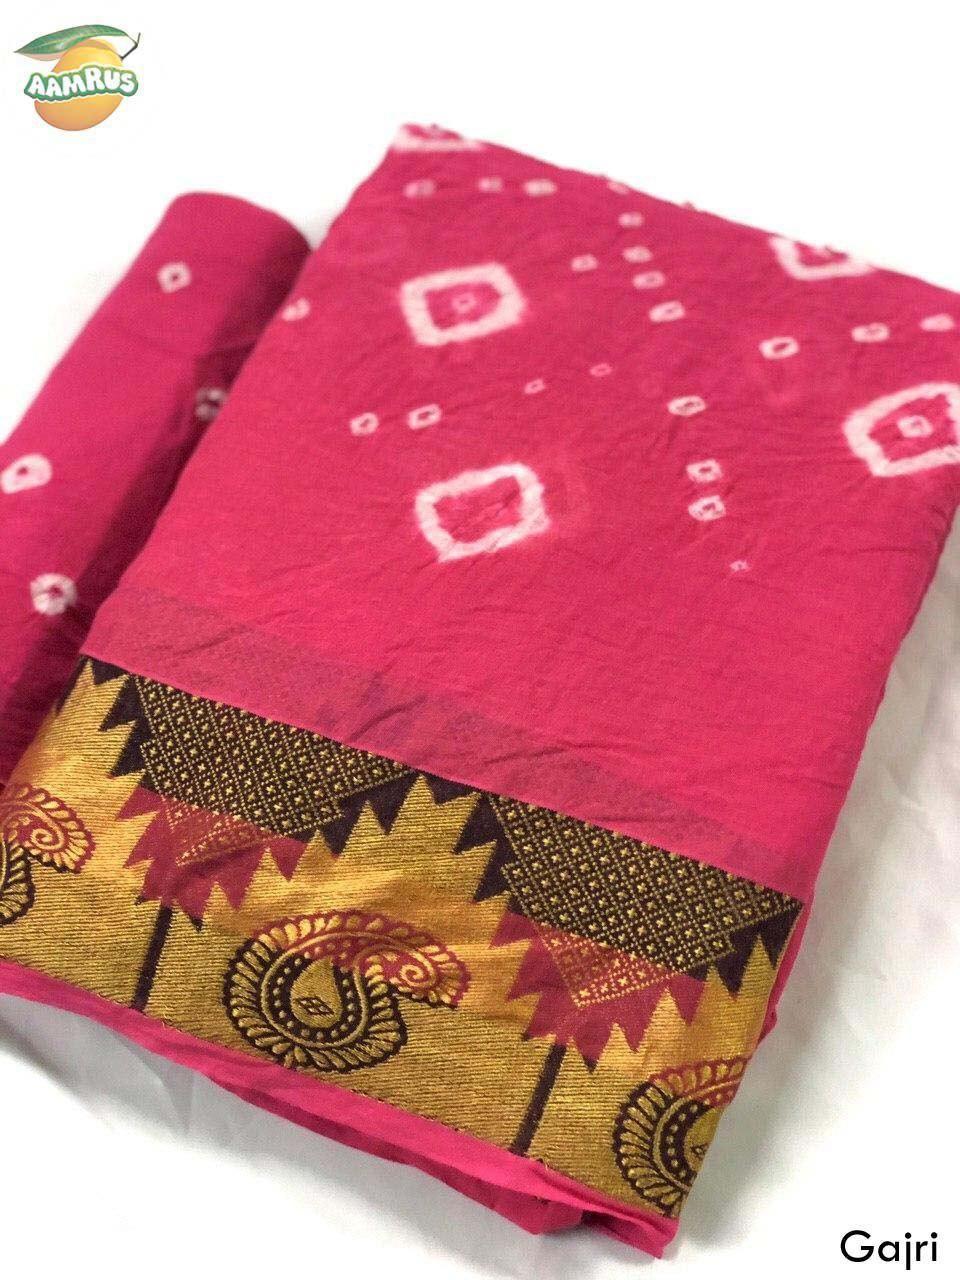 Ssm-Aamrus-Pure-Cotton-Saree-5